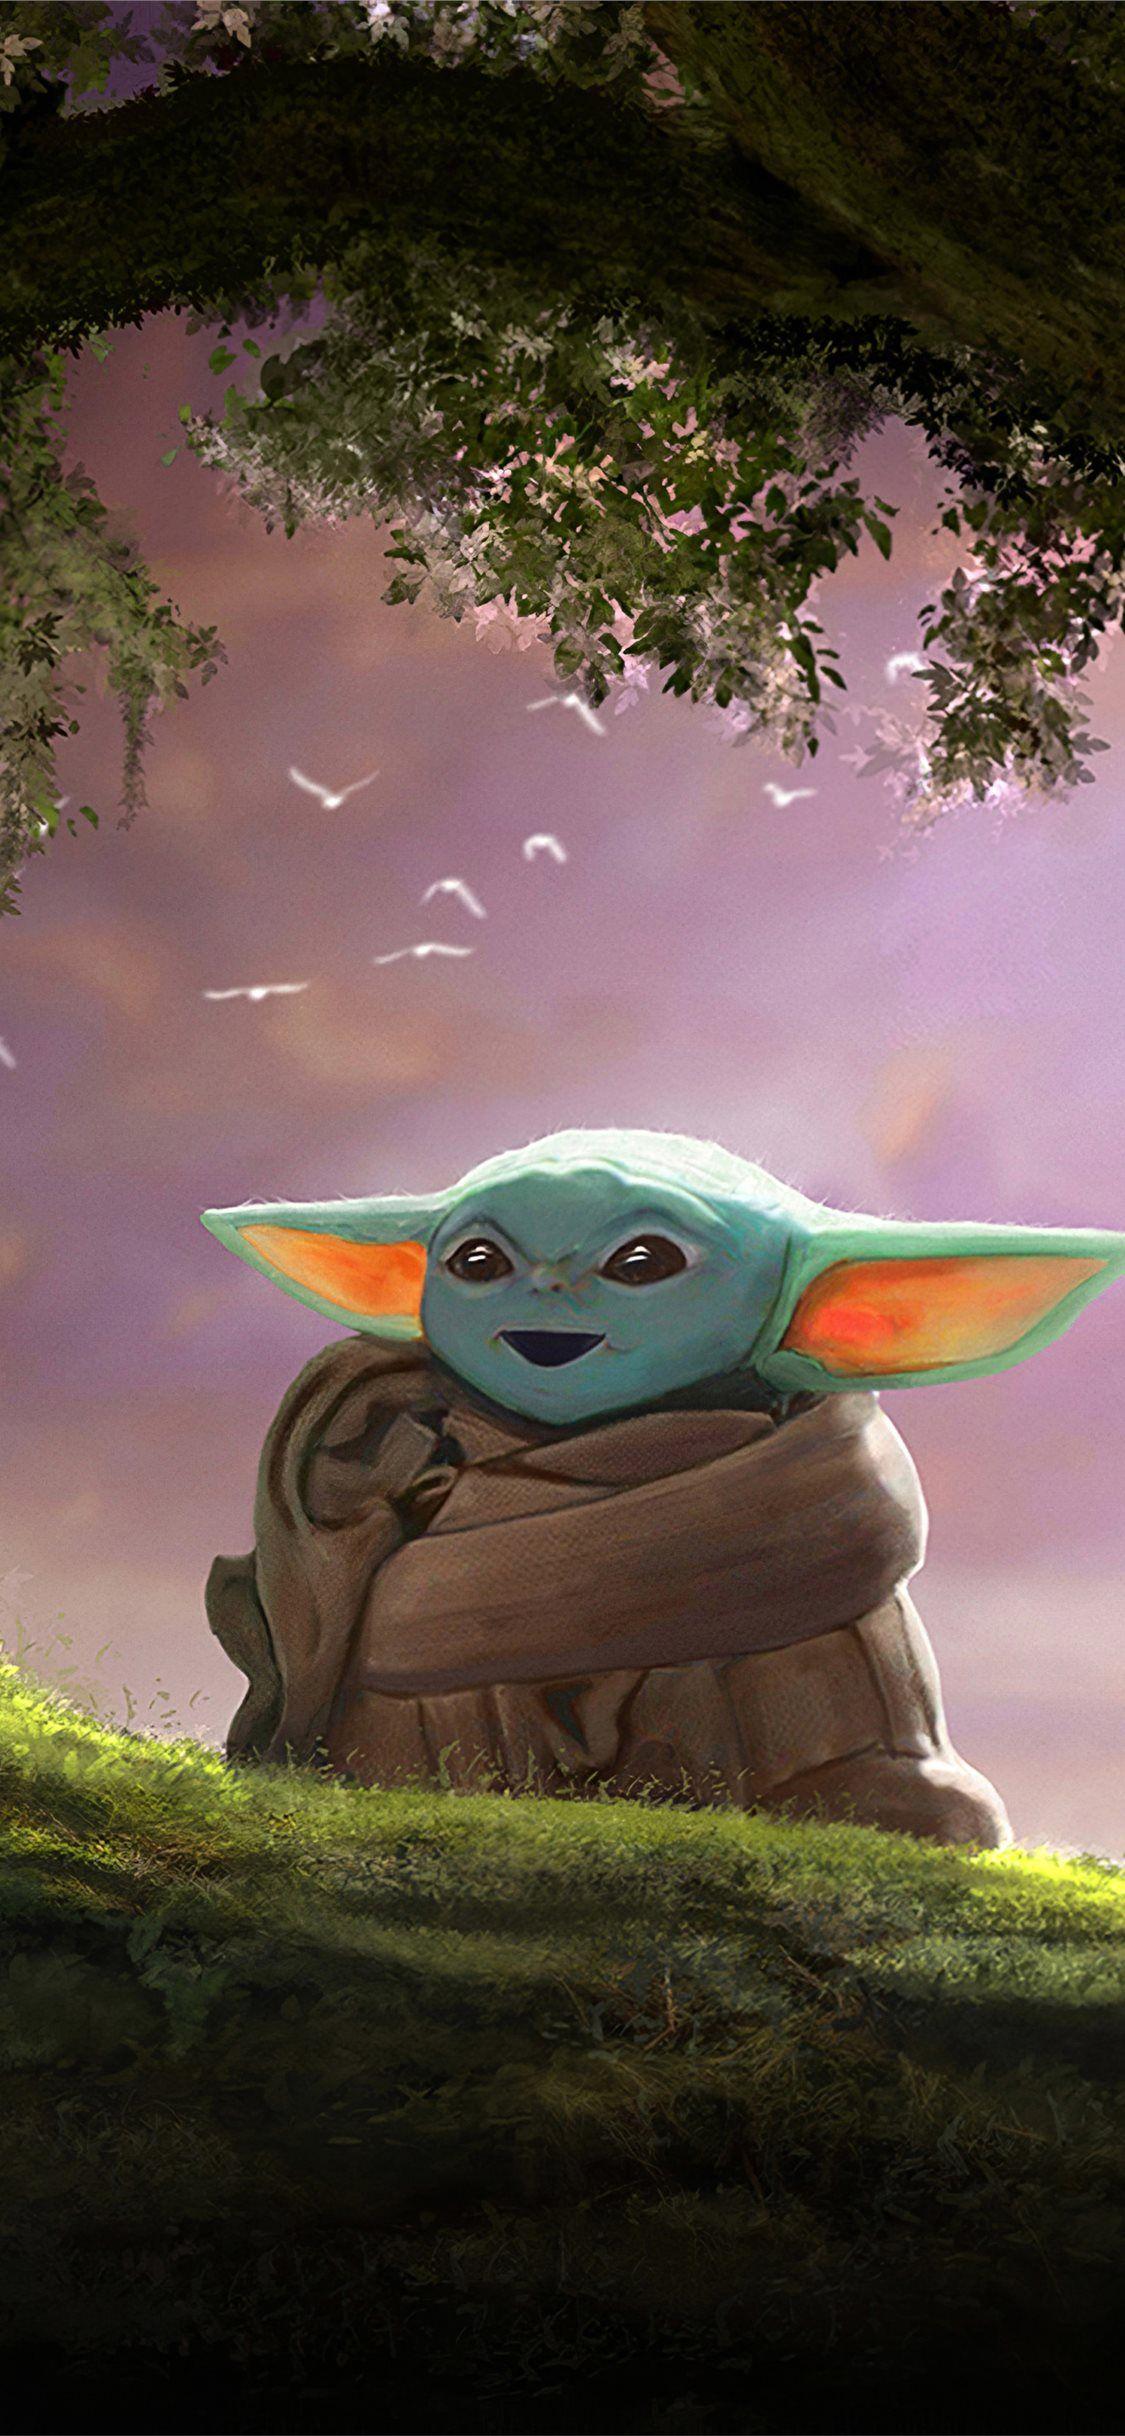 Baby Yoda Fanart 4k Starwars 4k Deviantart Movies Iphonexwallpaper Iphone Background Wallpaper Cute Disney Drawings Free Iphone Wallpaper